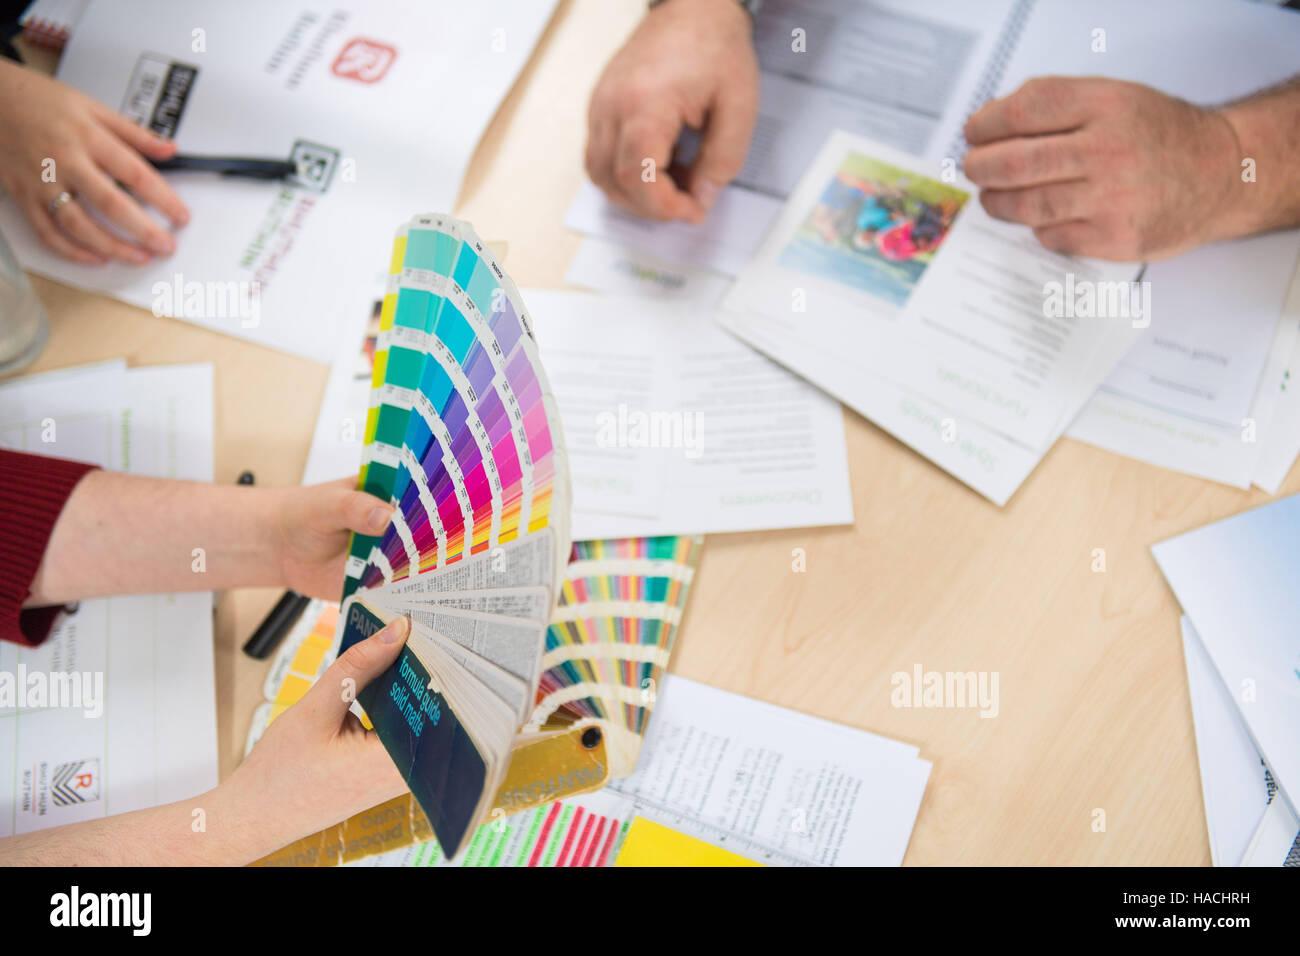 Fan Pantone Colour Stockfotos & Fan Pantone Colour Bilder - Alamy